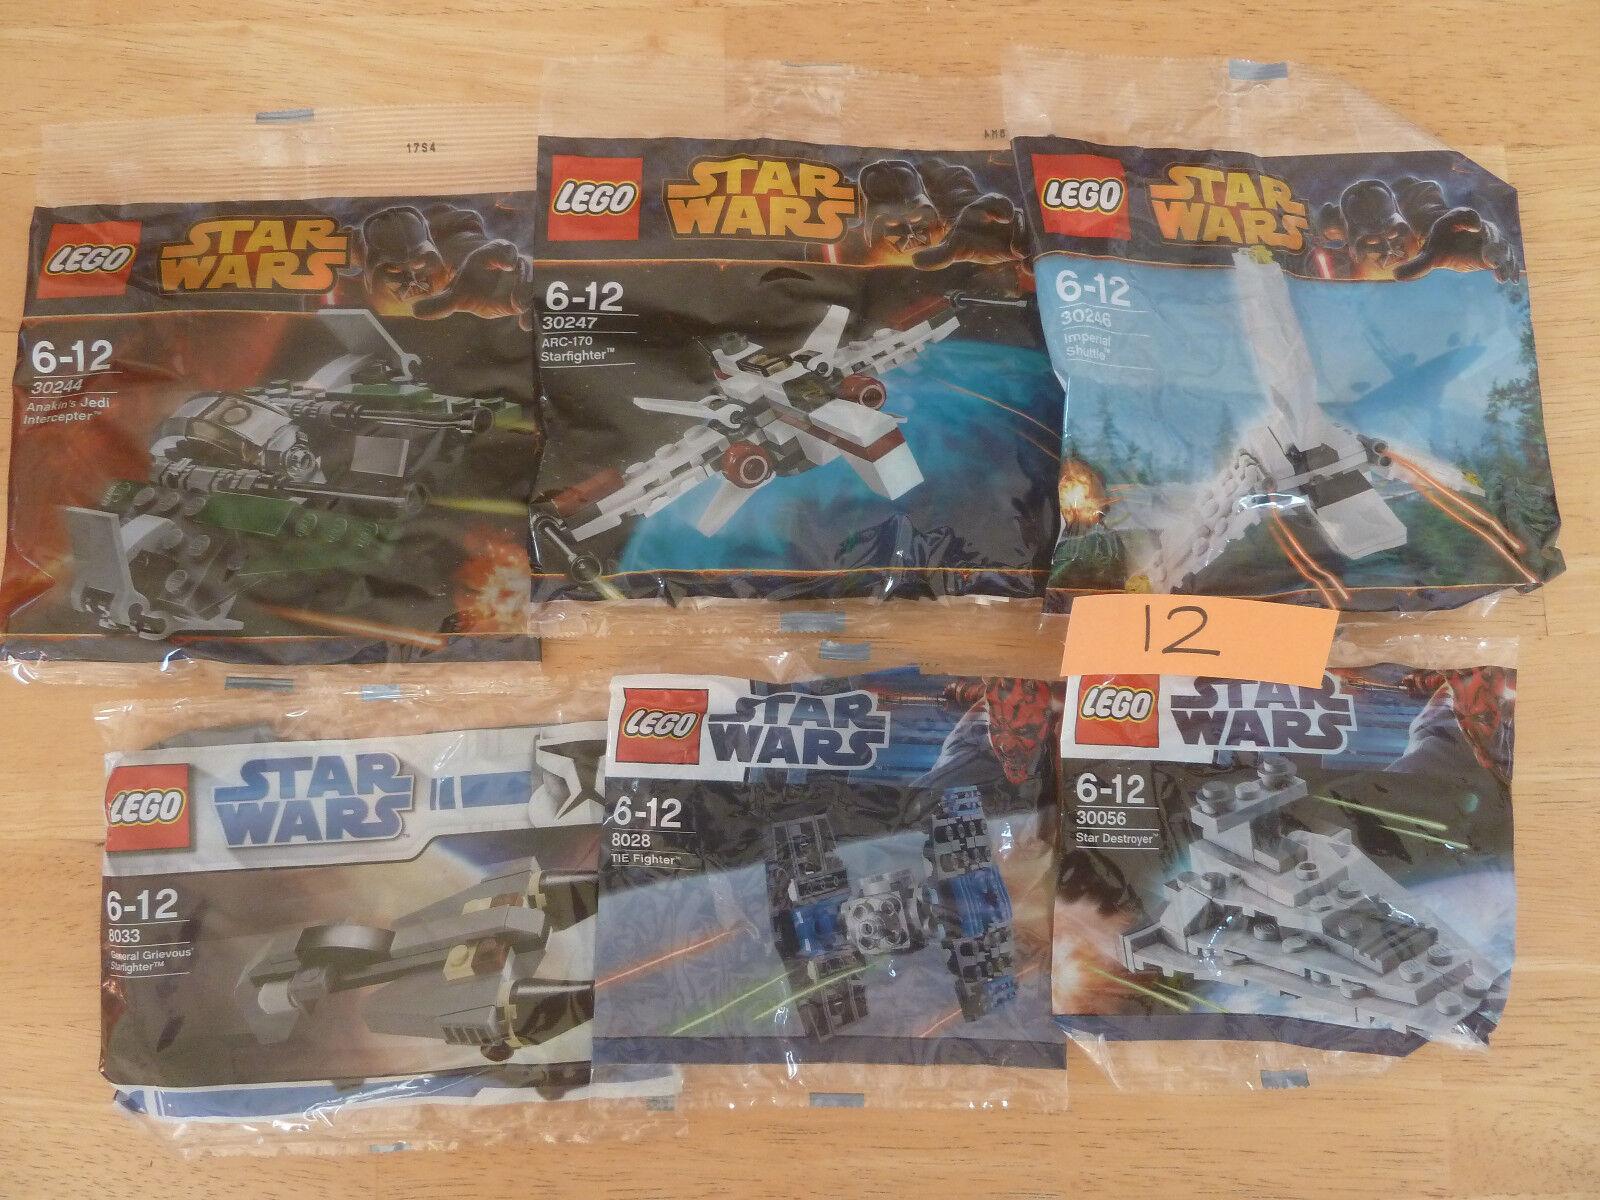 6 x Lego Sets  - Star Wars - ARC-170 Star Fighter Destroyer General Grievous  12